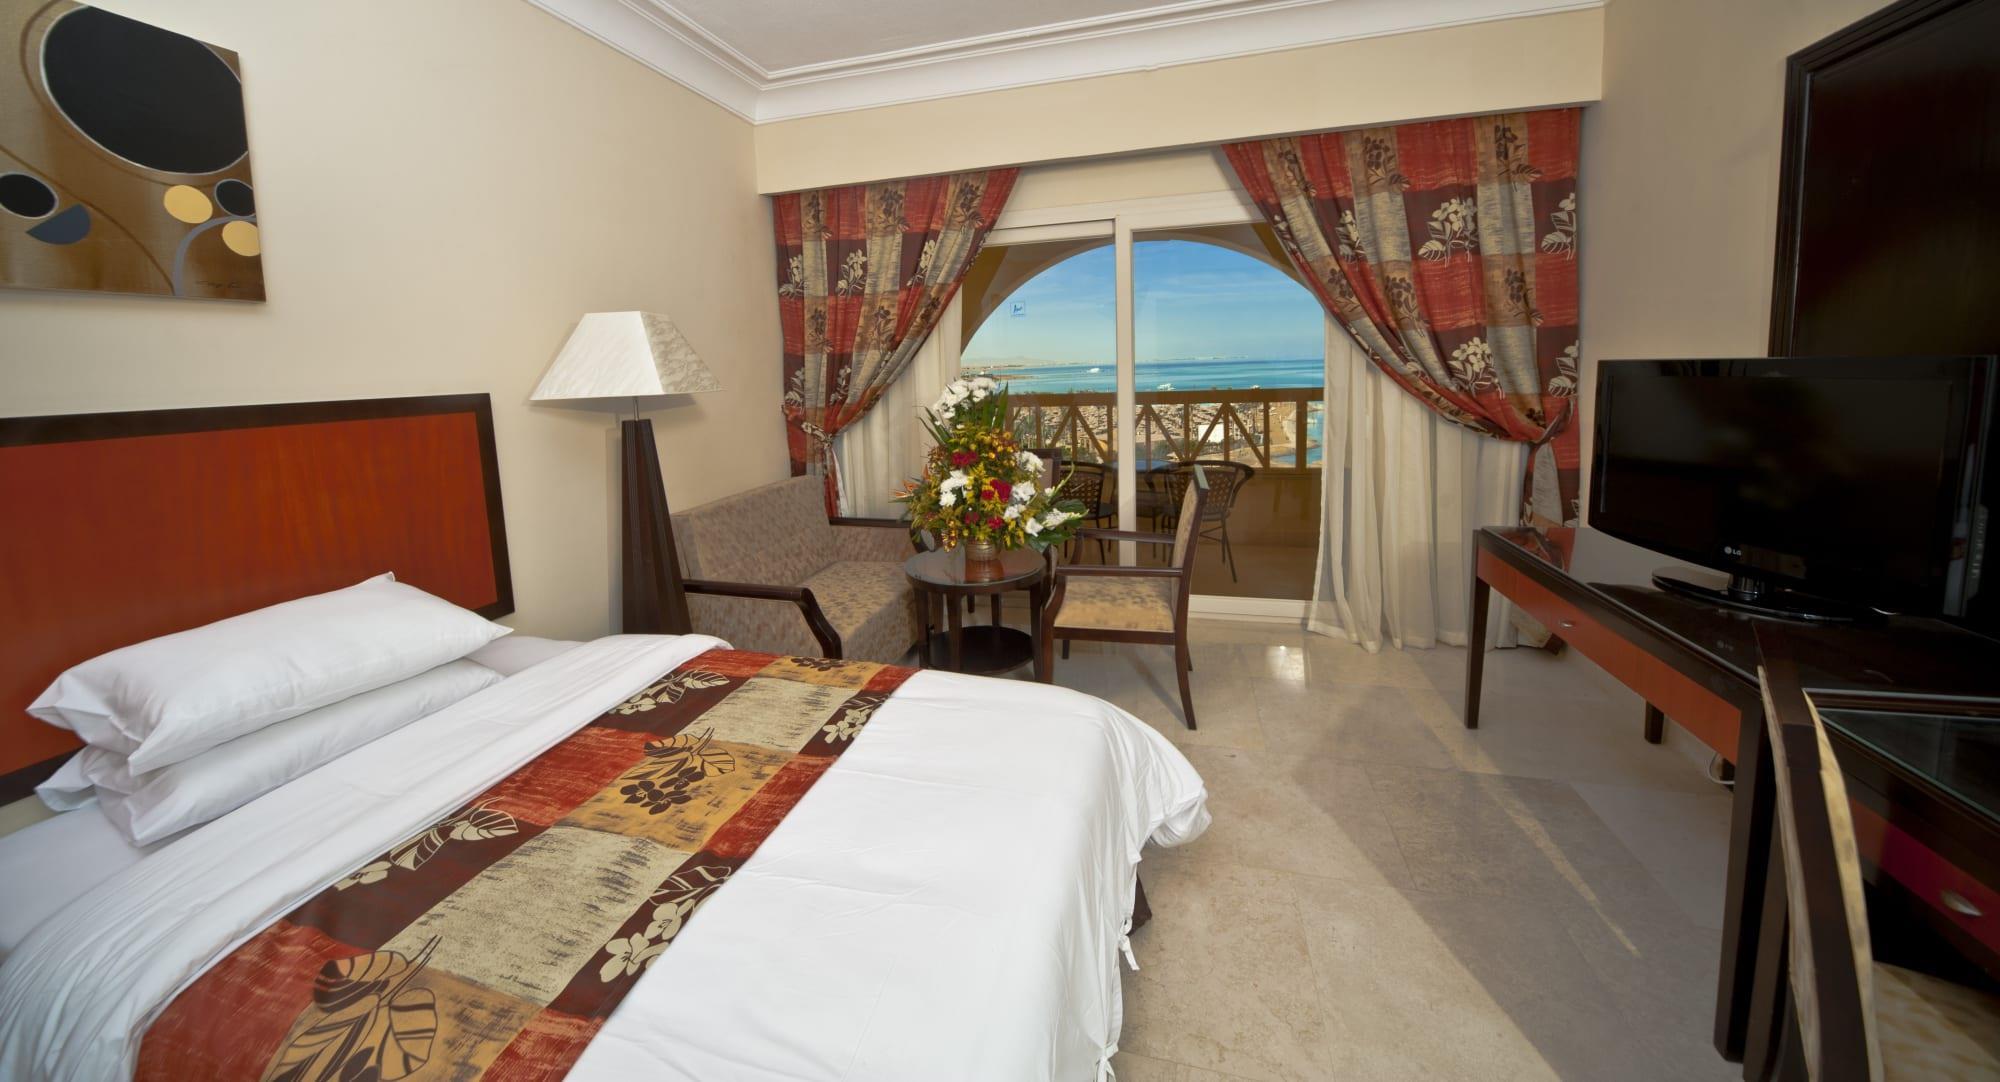 amc-royal-hotel-oda-0014